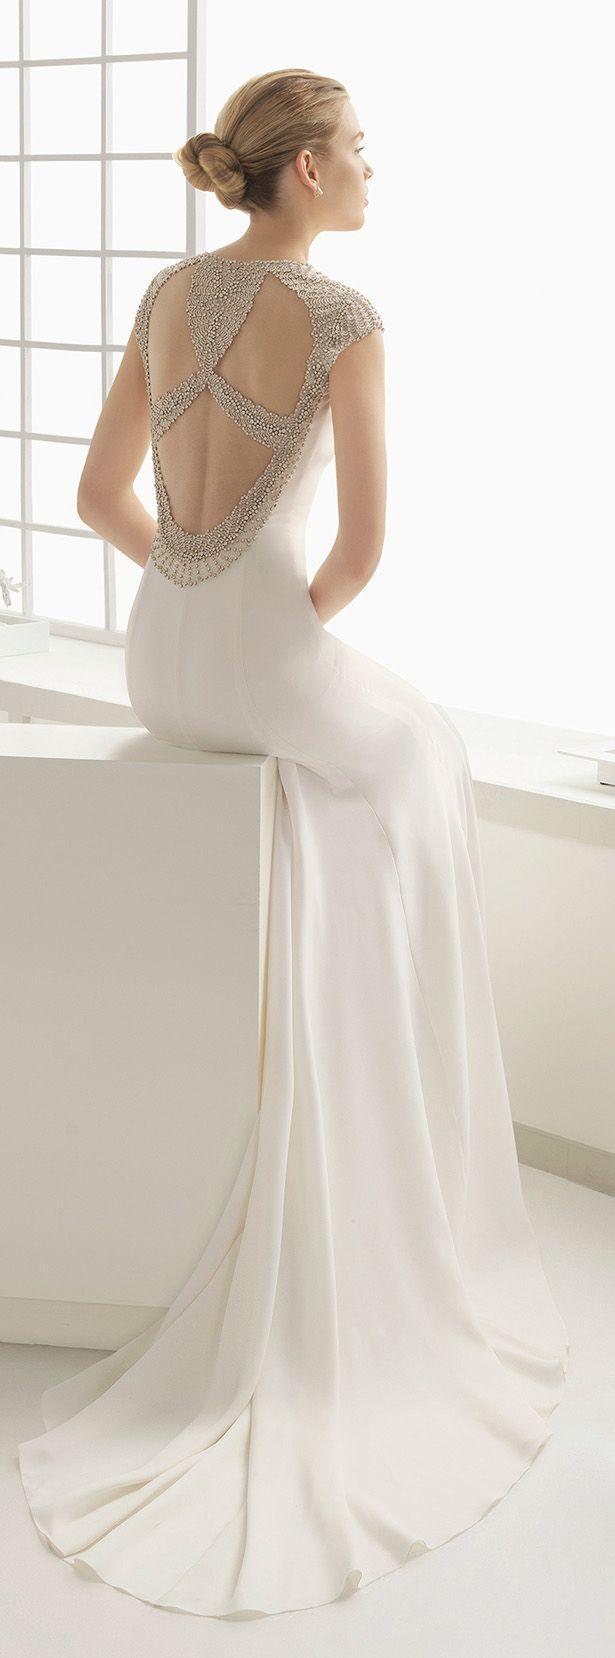 Mariage - Rosa Clara 2016 Bridal Collection